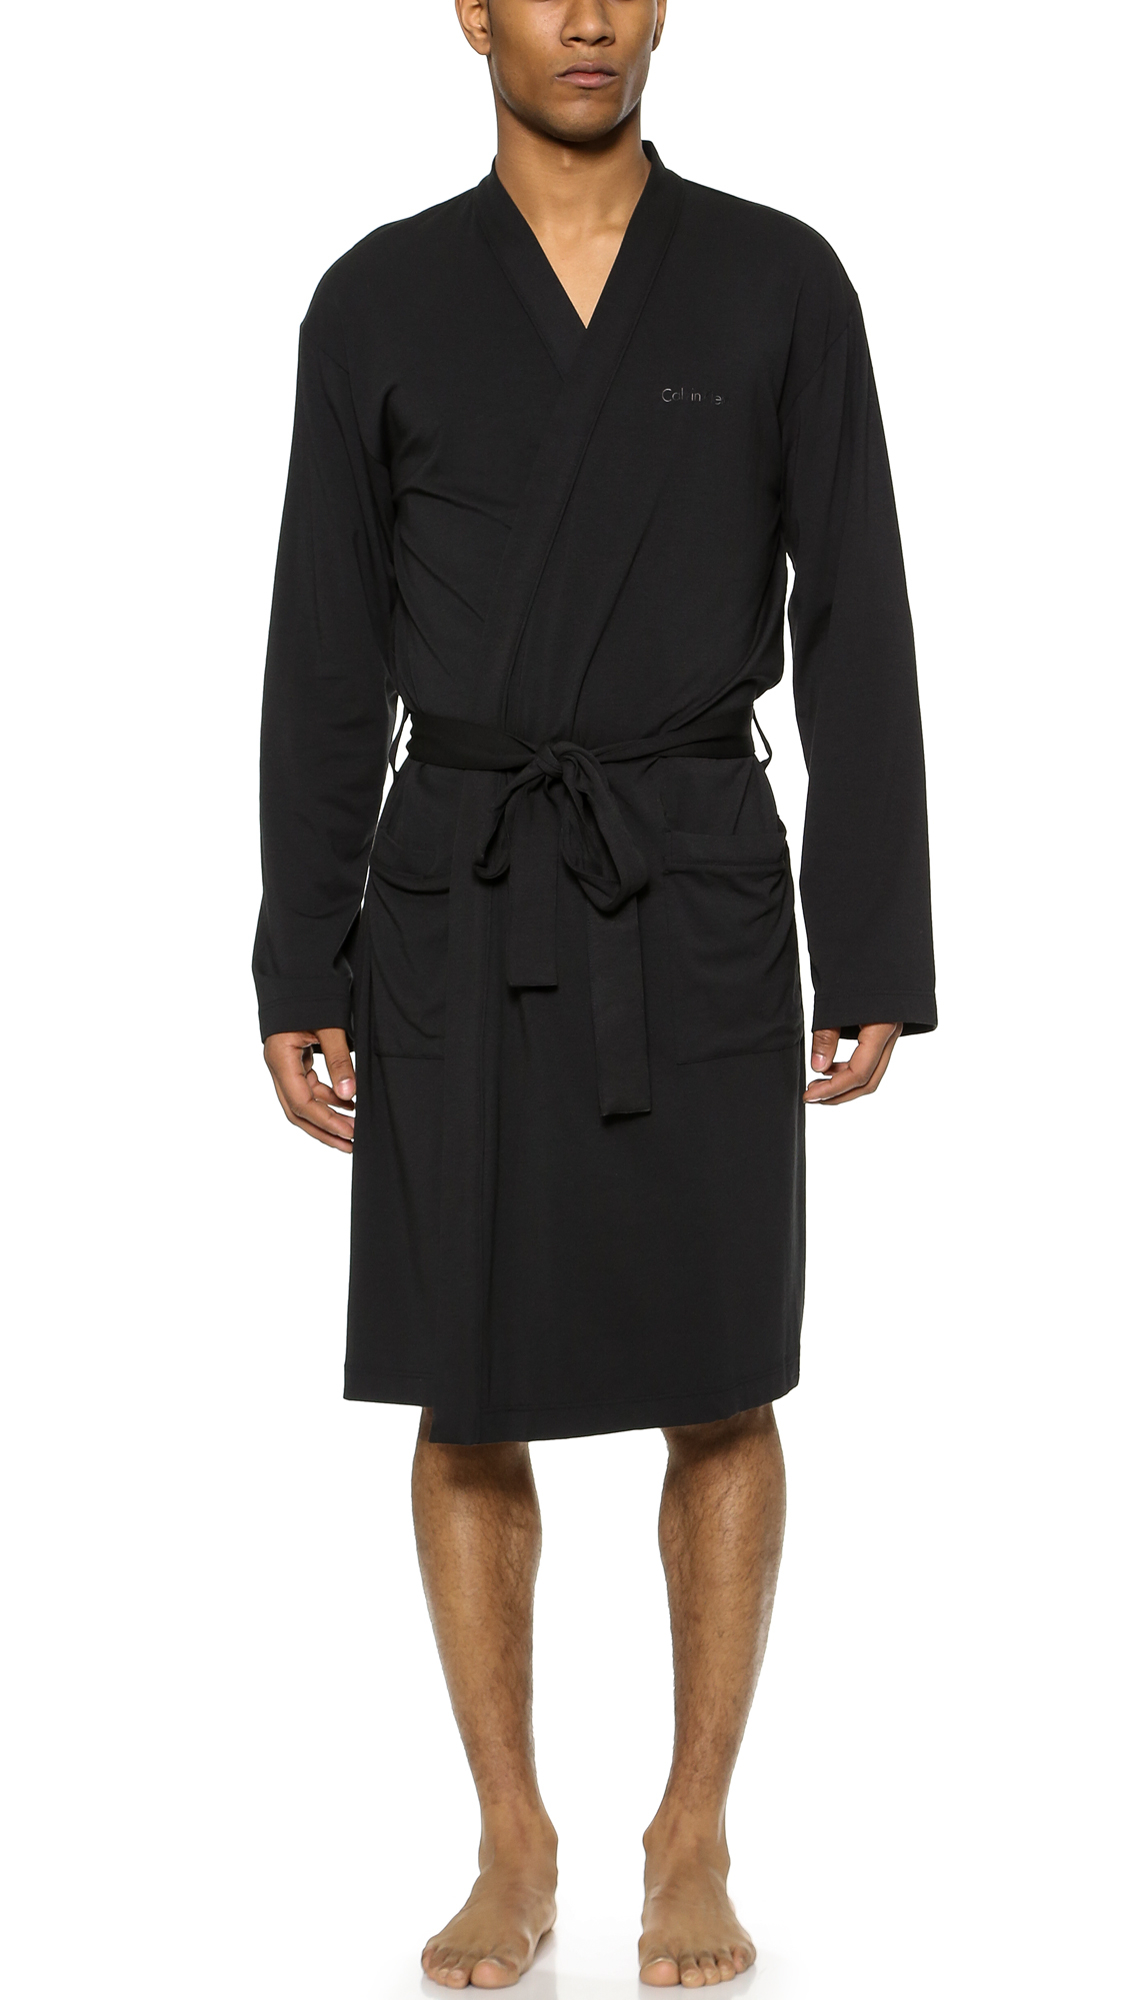 Calvin Klein Cotton Modal Robe In Black For Men Lyst